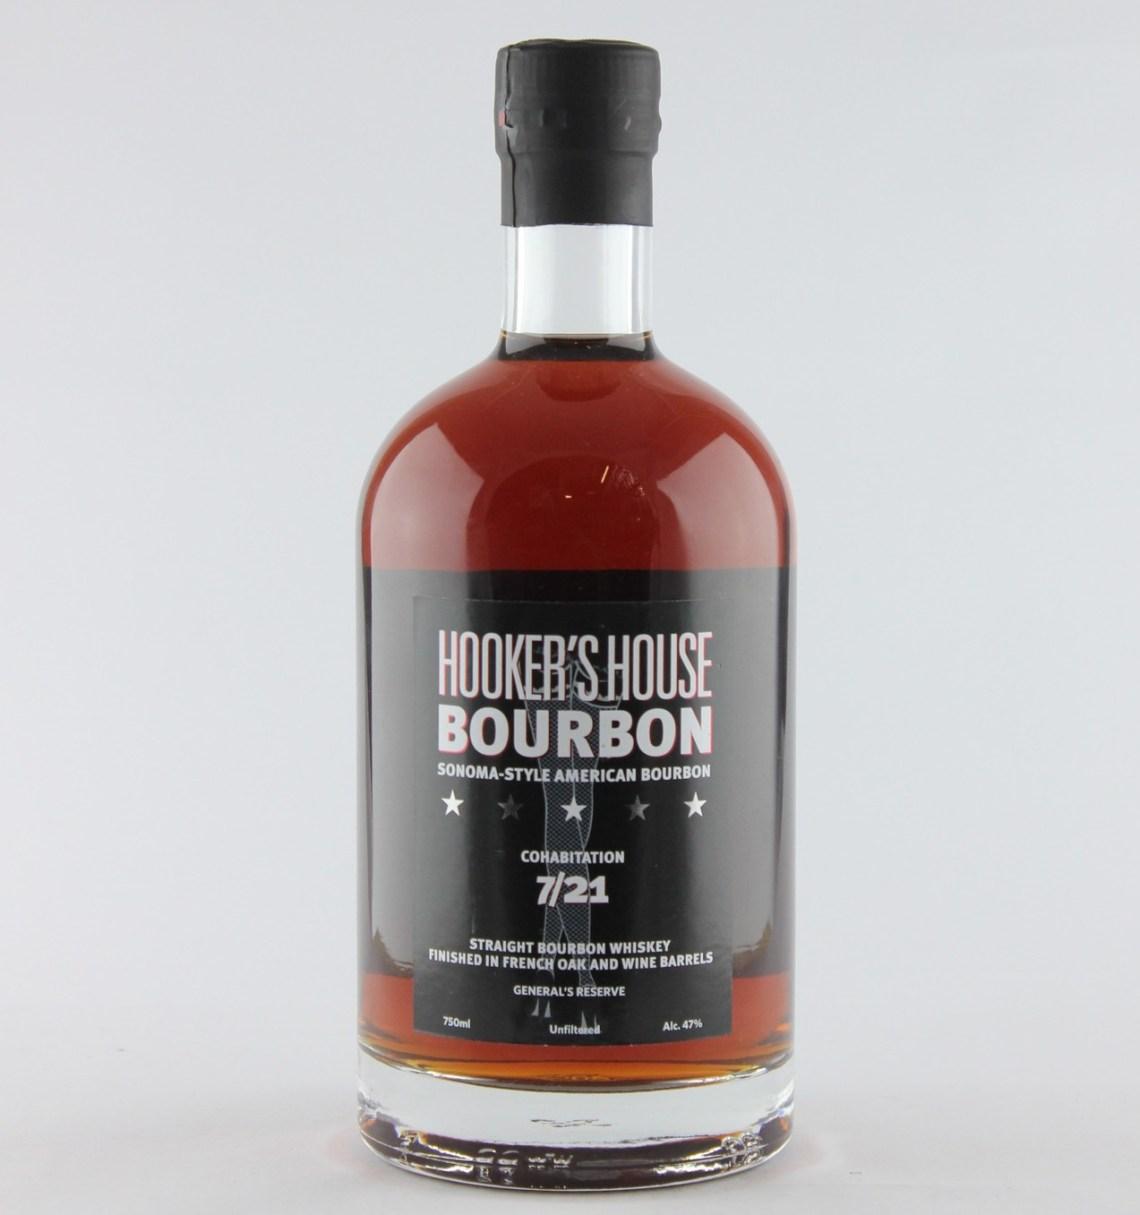 Hooker's House Bourbon Cohabitation 7/21